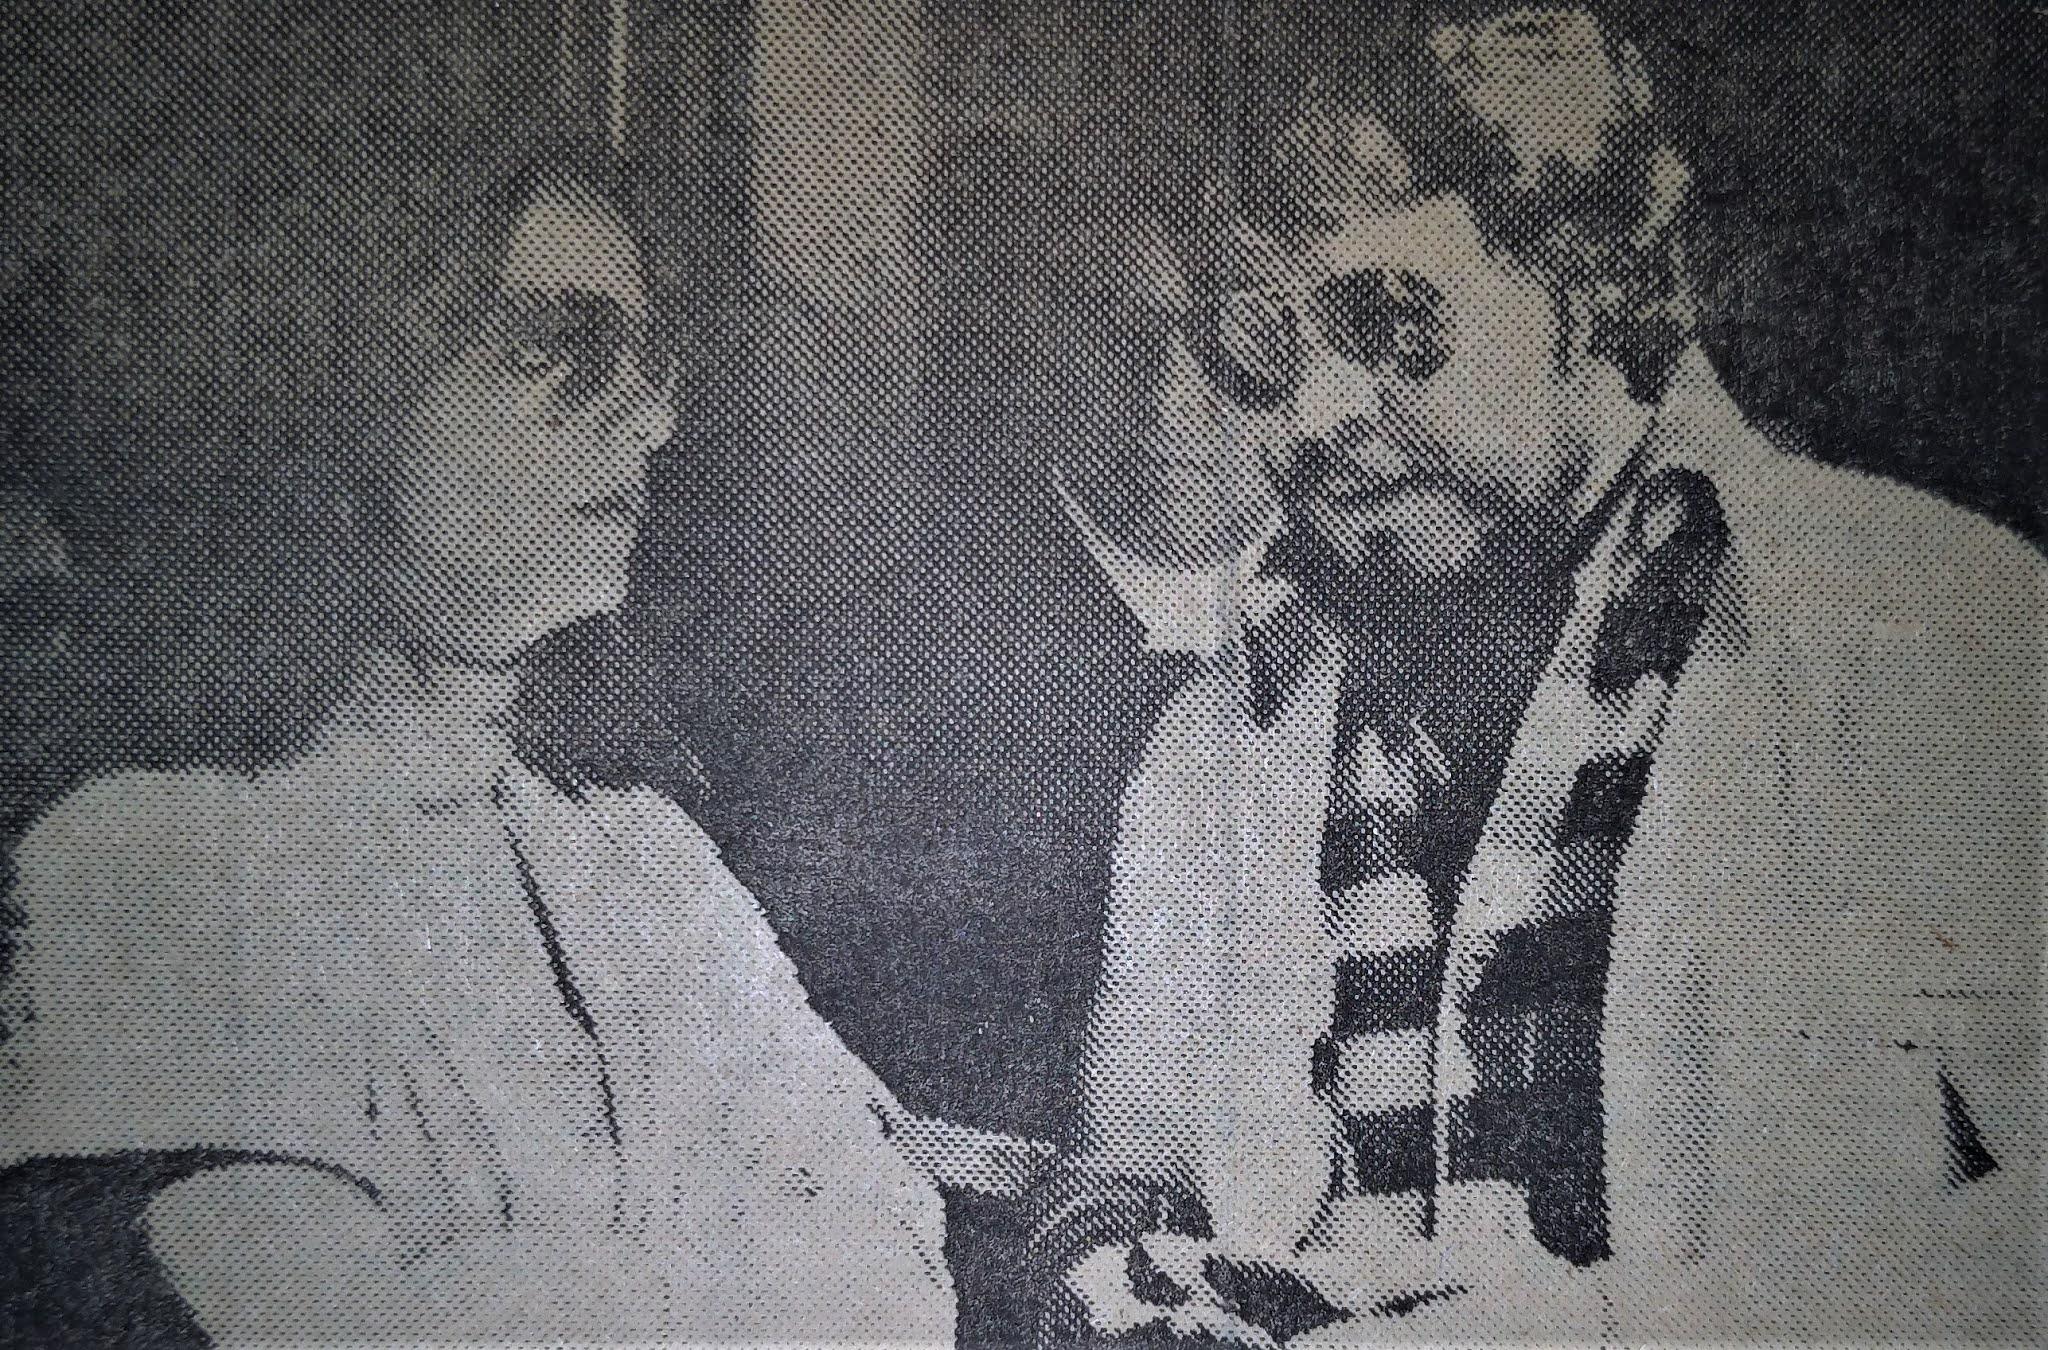 Bruna Lombardi e Joel Cardoso - 1978